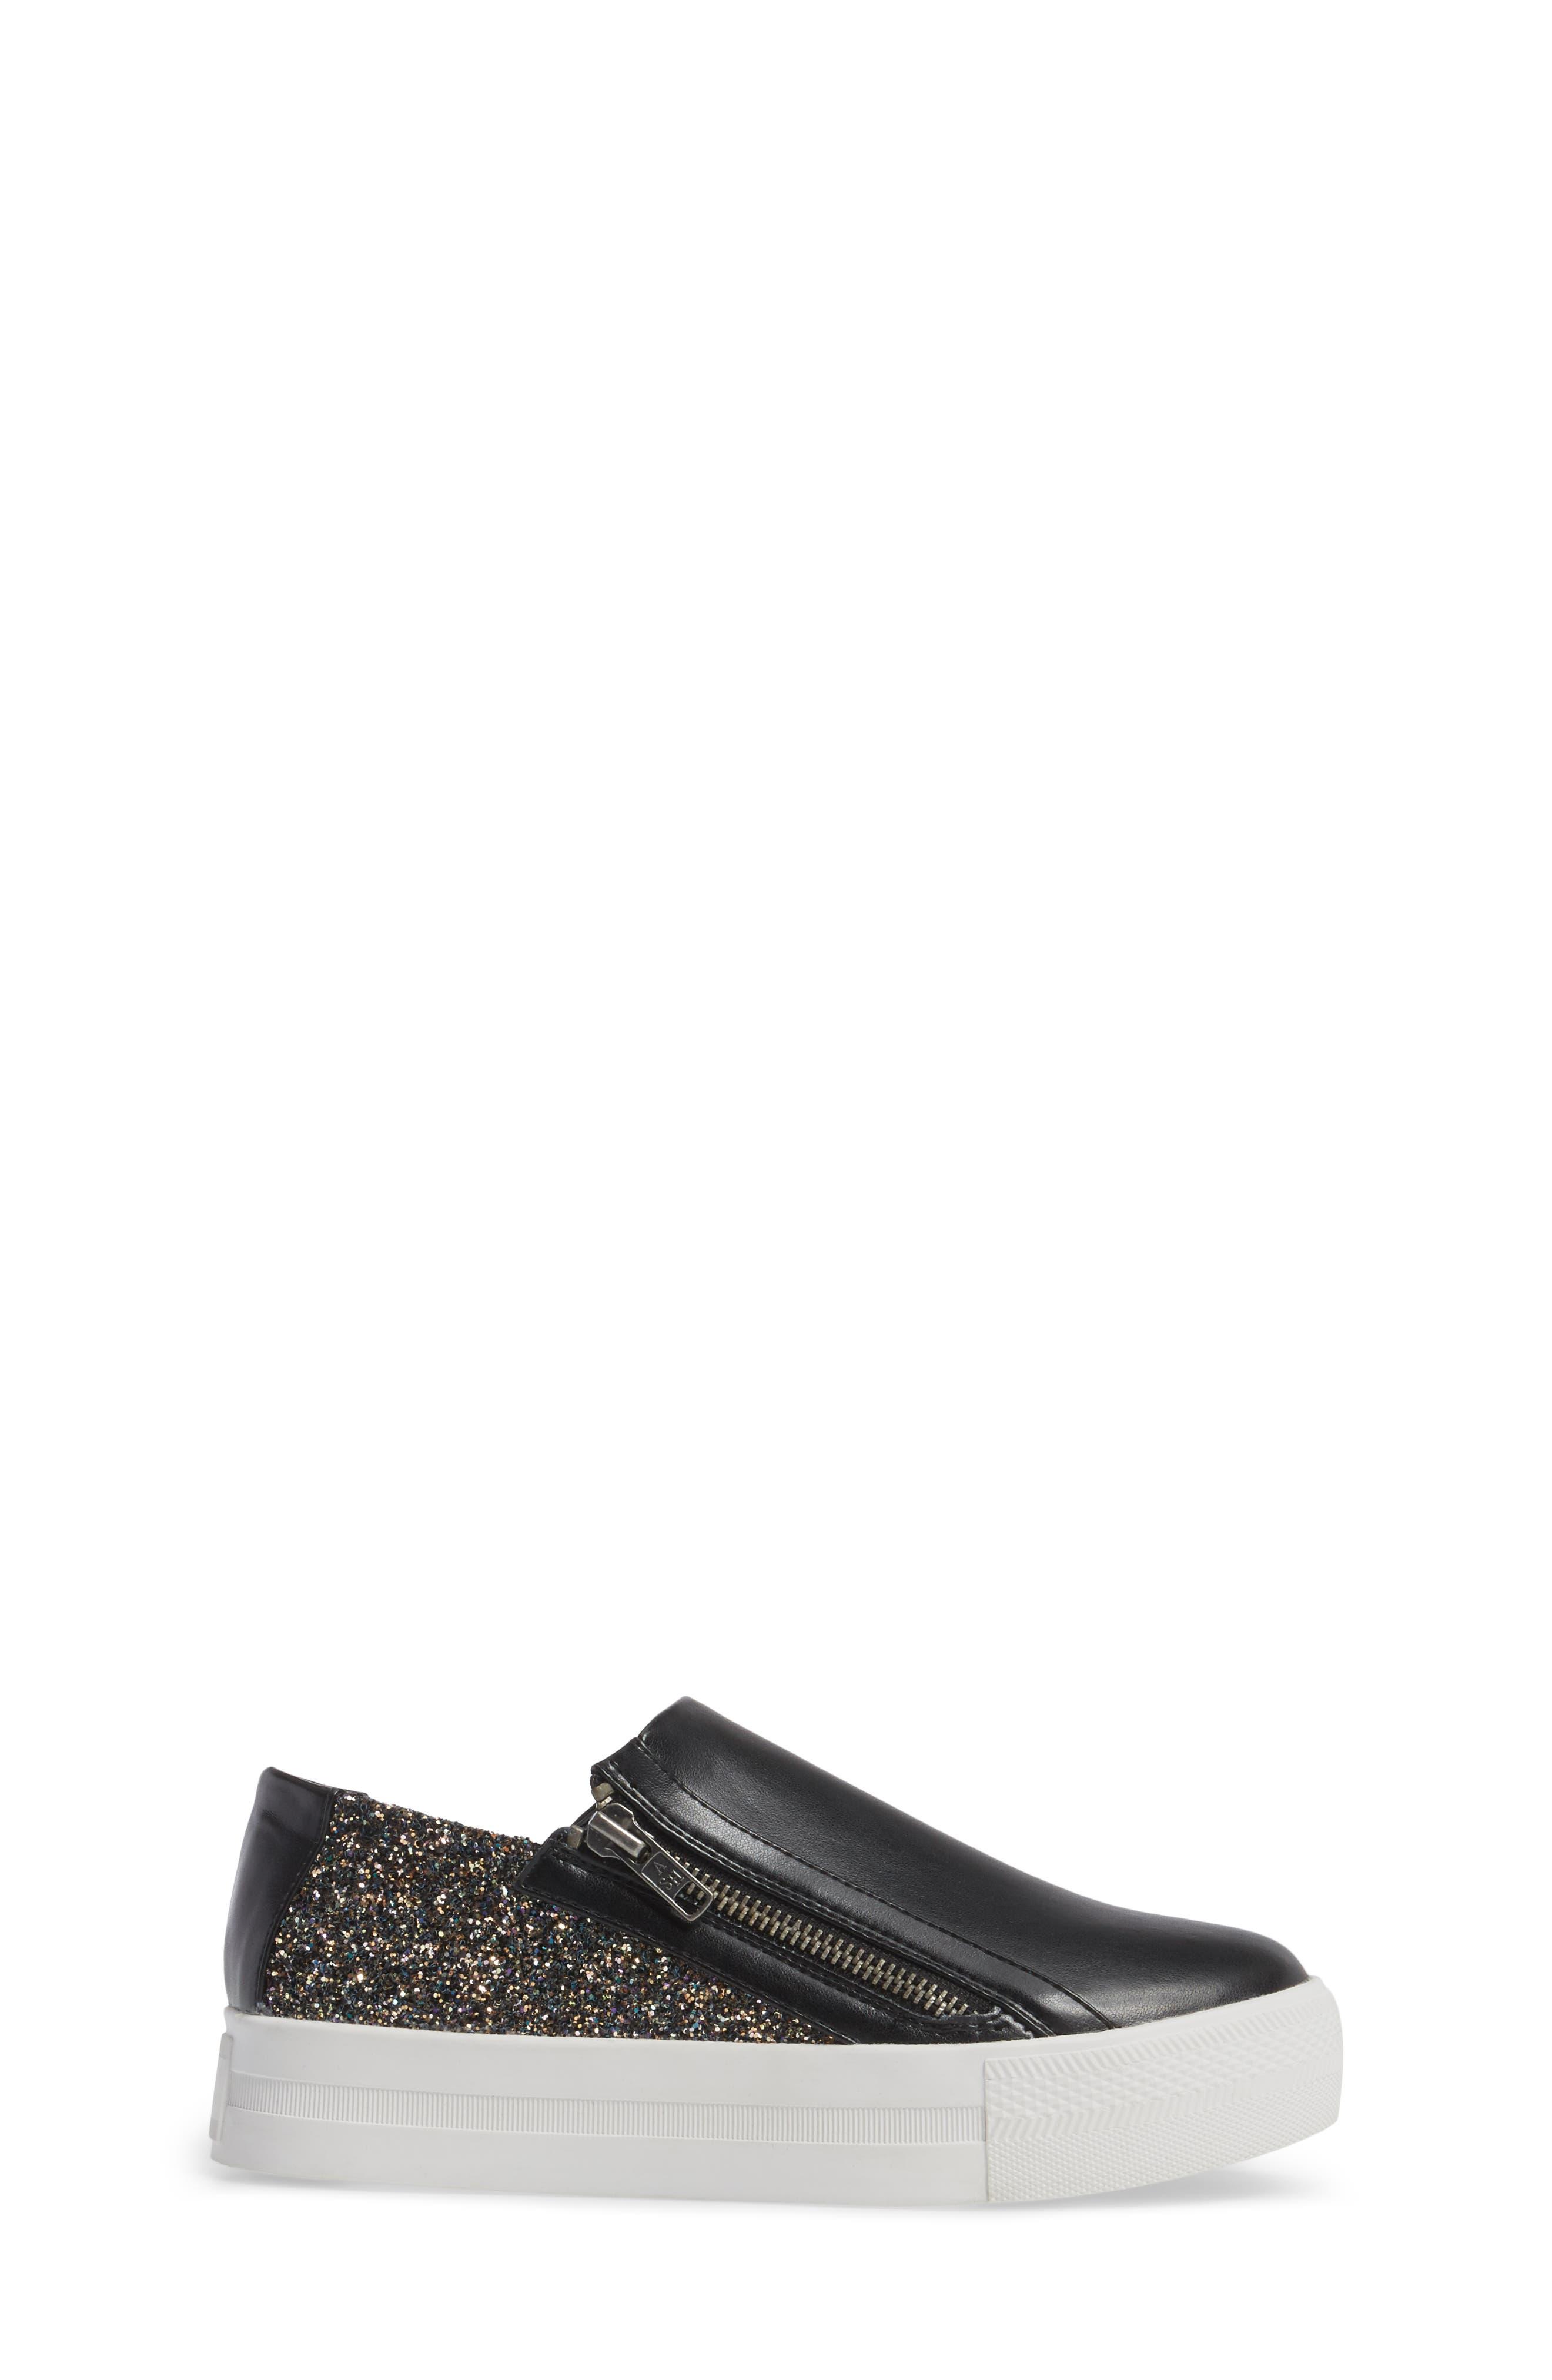 Lynn Monica Glittery Zip Sneaker,                             Alternate thumbnail 3, color,                             Black Faux Leather